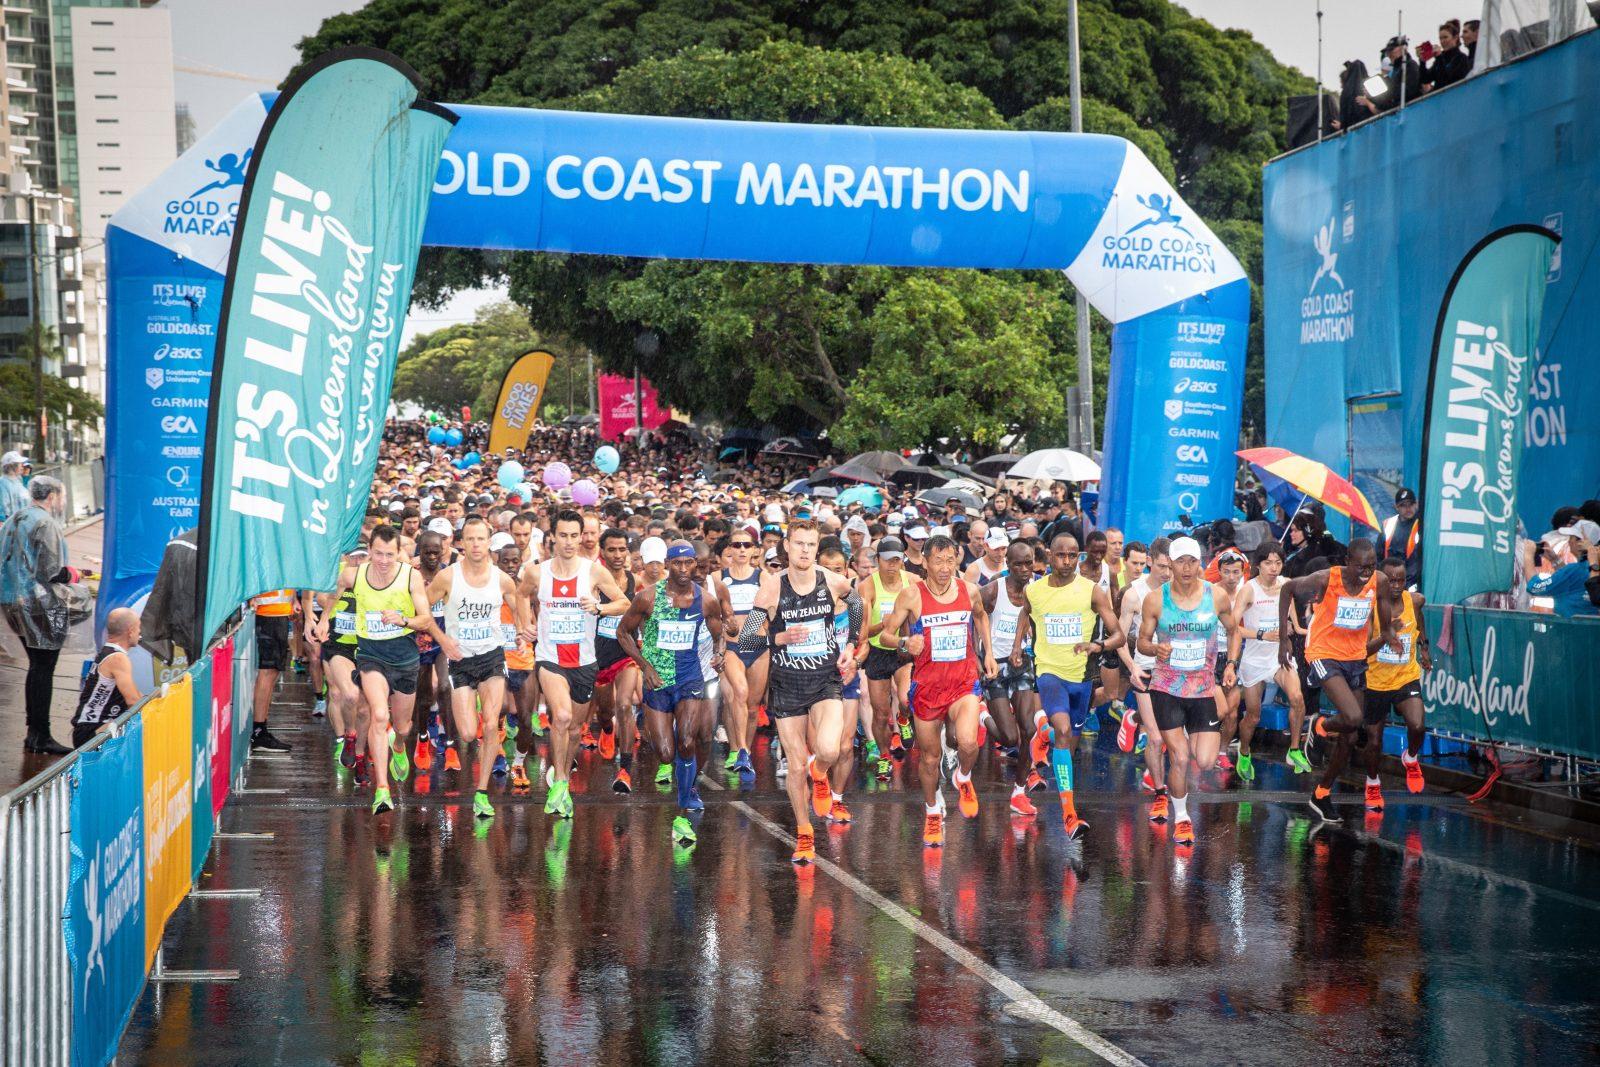 Gold Coast Marathon start